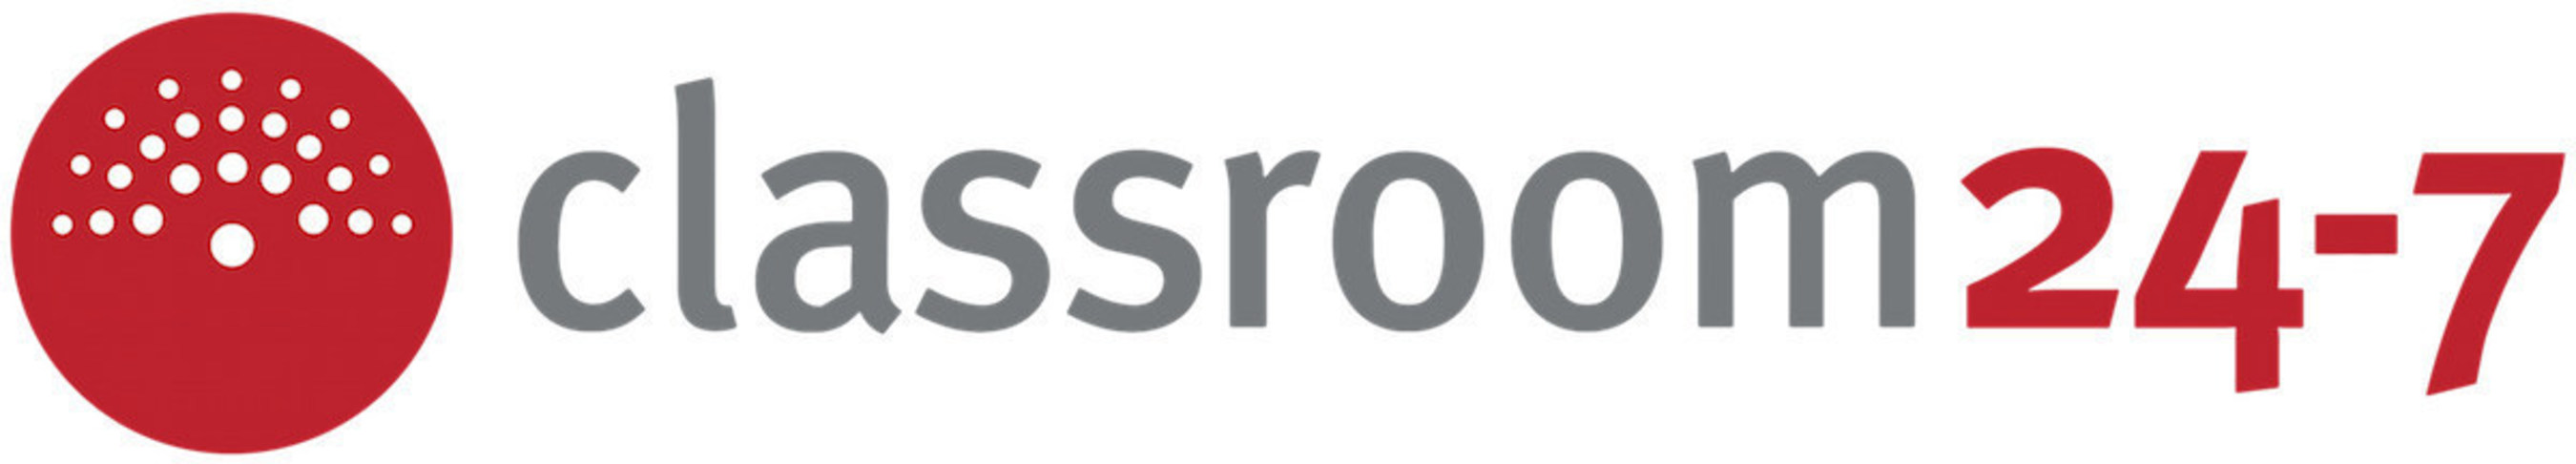 Classroom24-7, LLC Logo